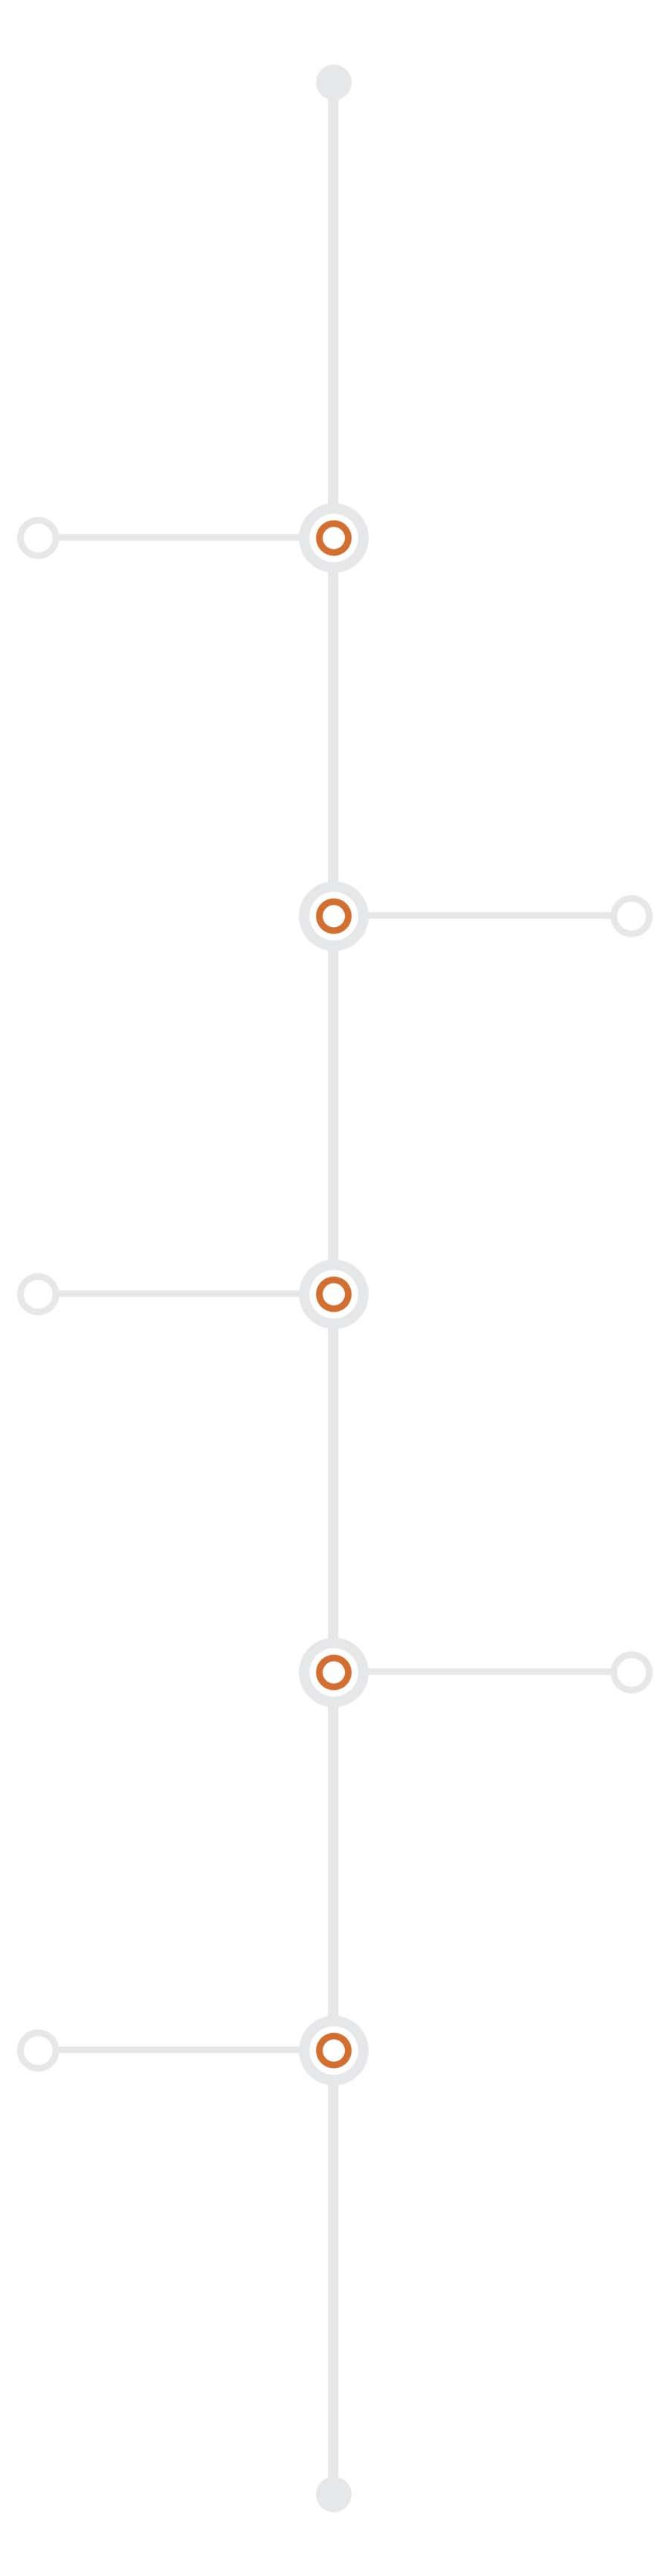 http://ldsv.ca/wp-content/uploads/2018/02/timeline-final.jpg